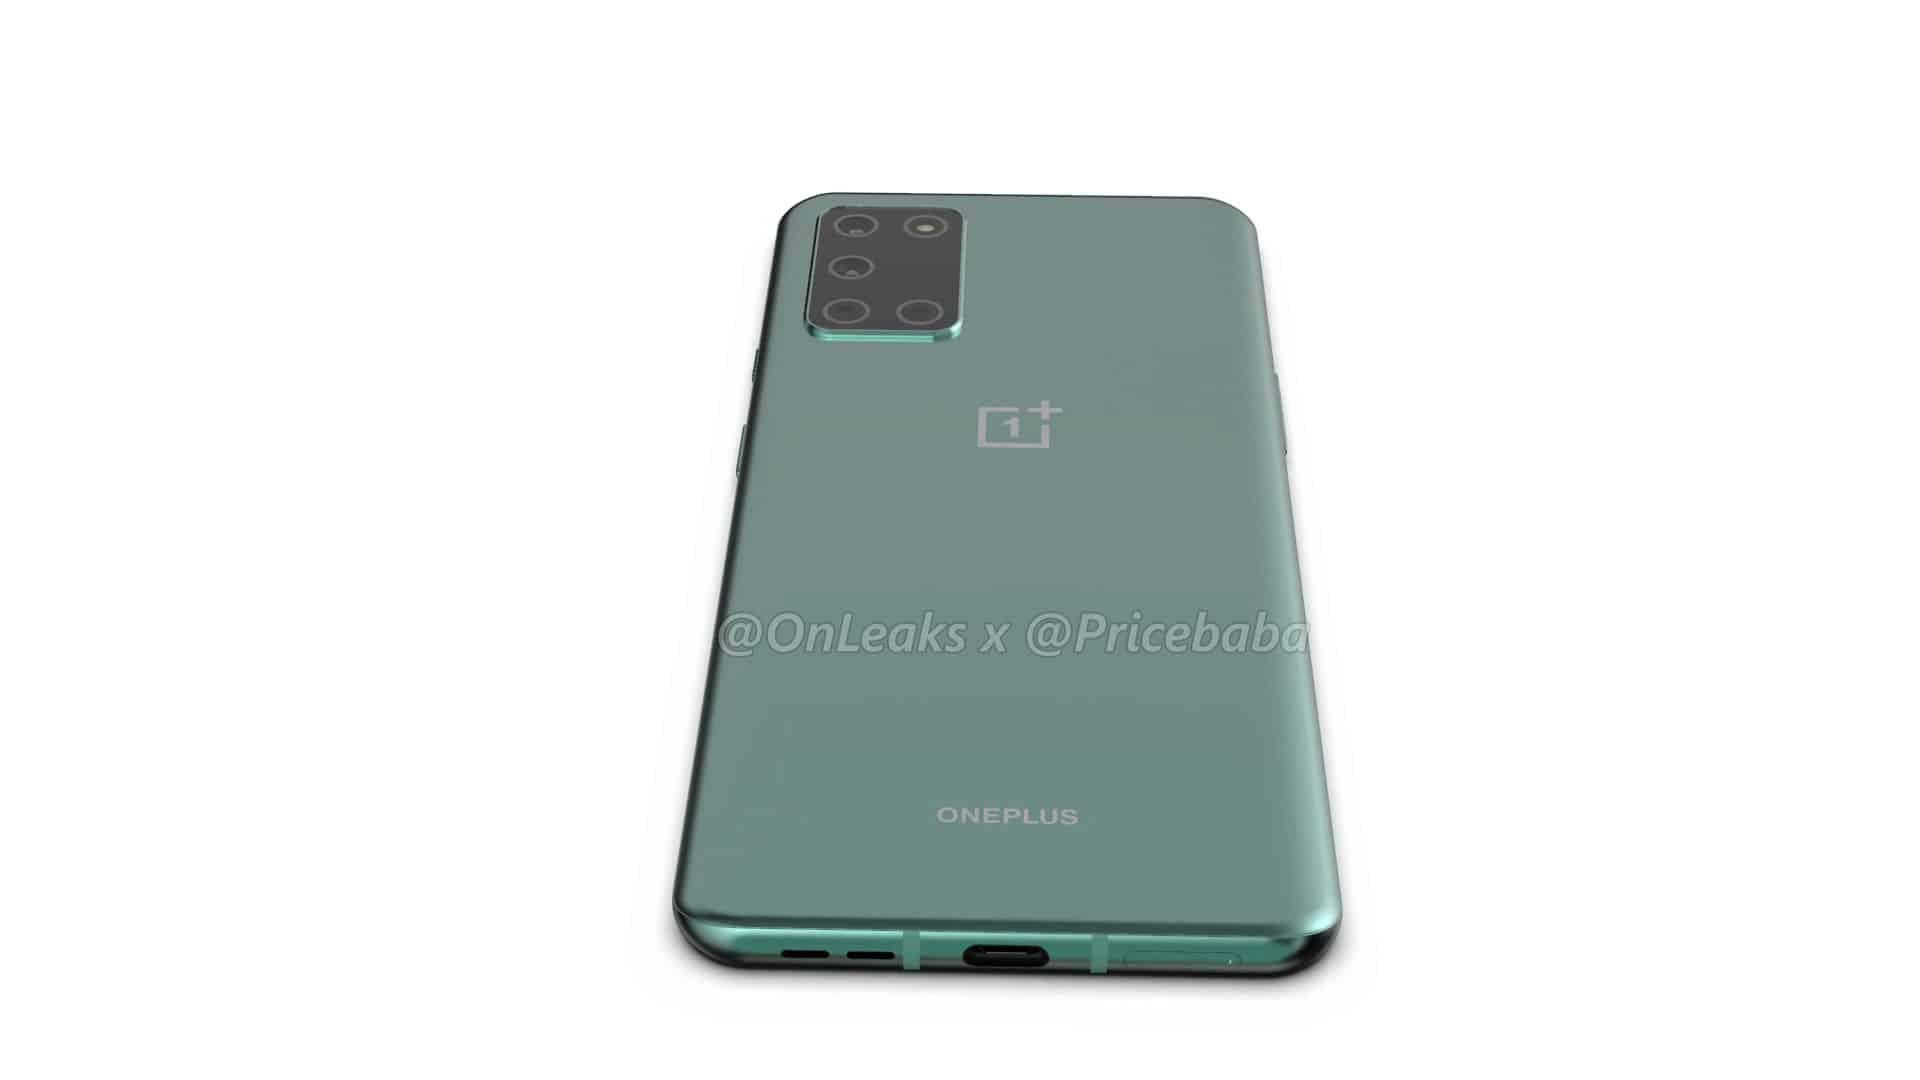 OnePlus 8T Pricebaba image 13